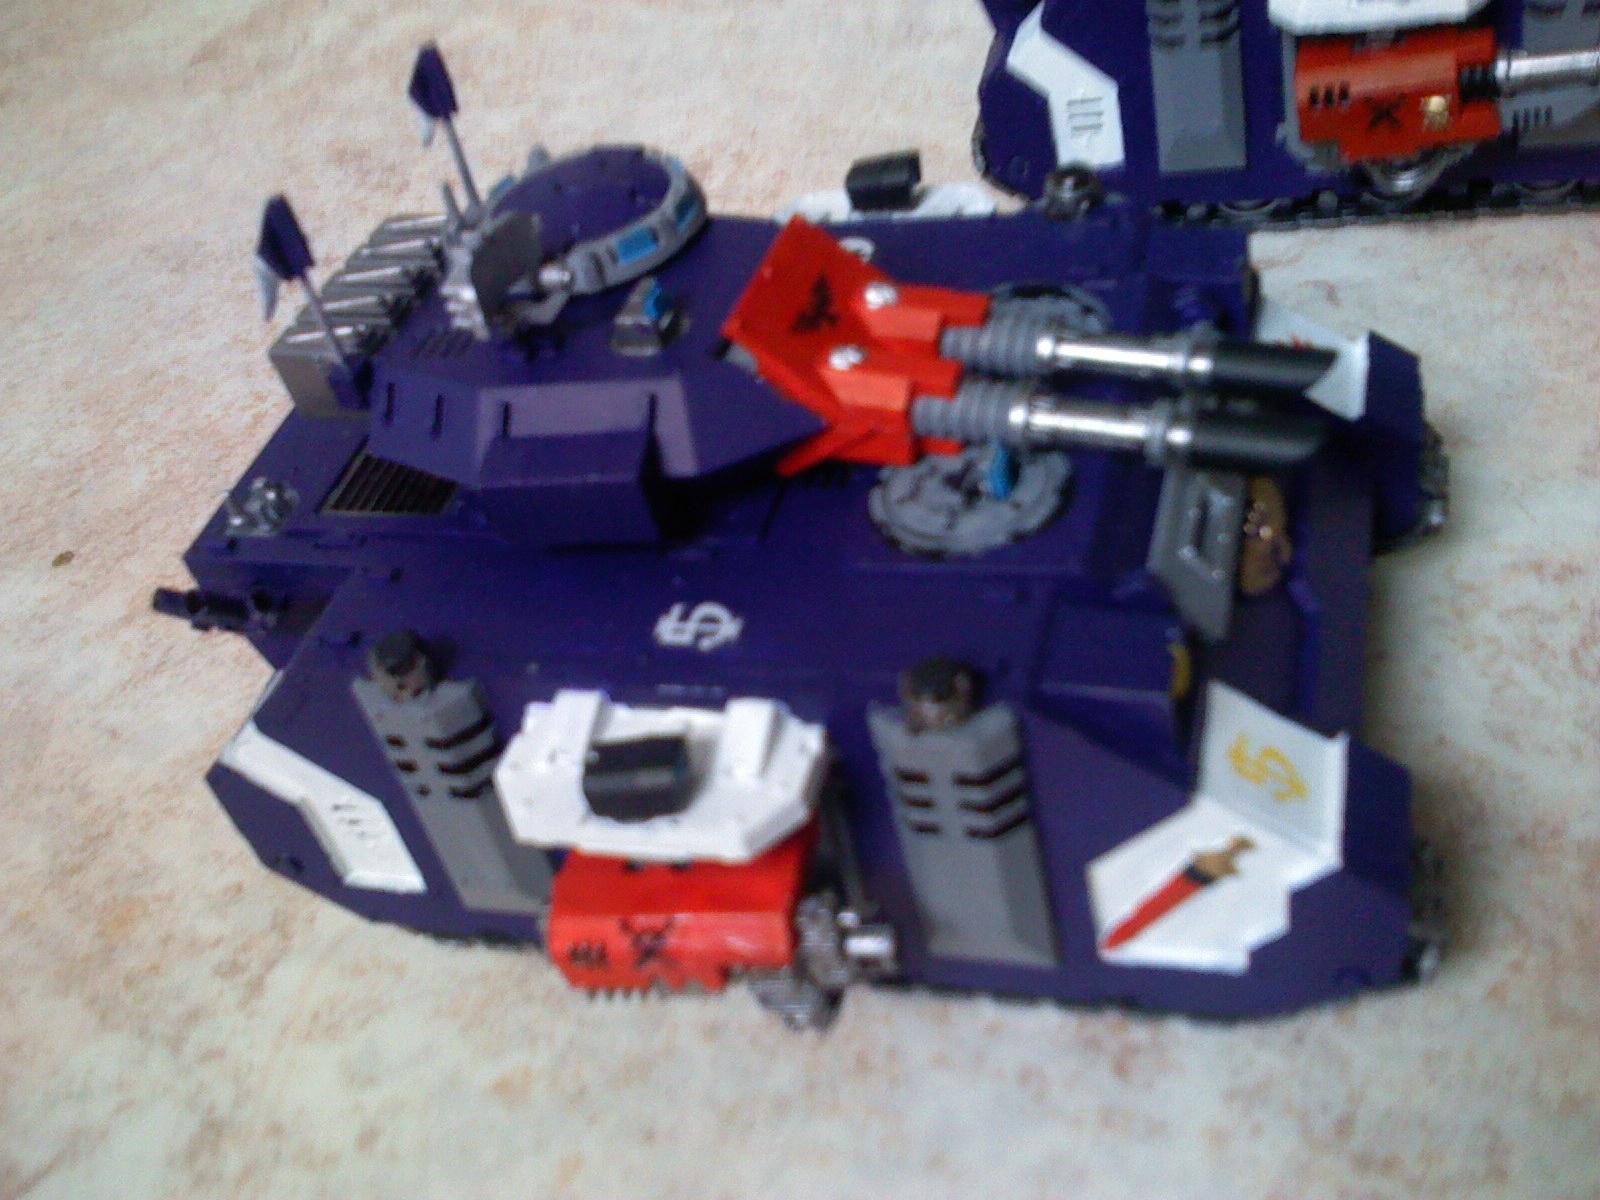 Crimson Swords, Predator, Space Marines, Warhammer 40,000